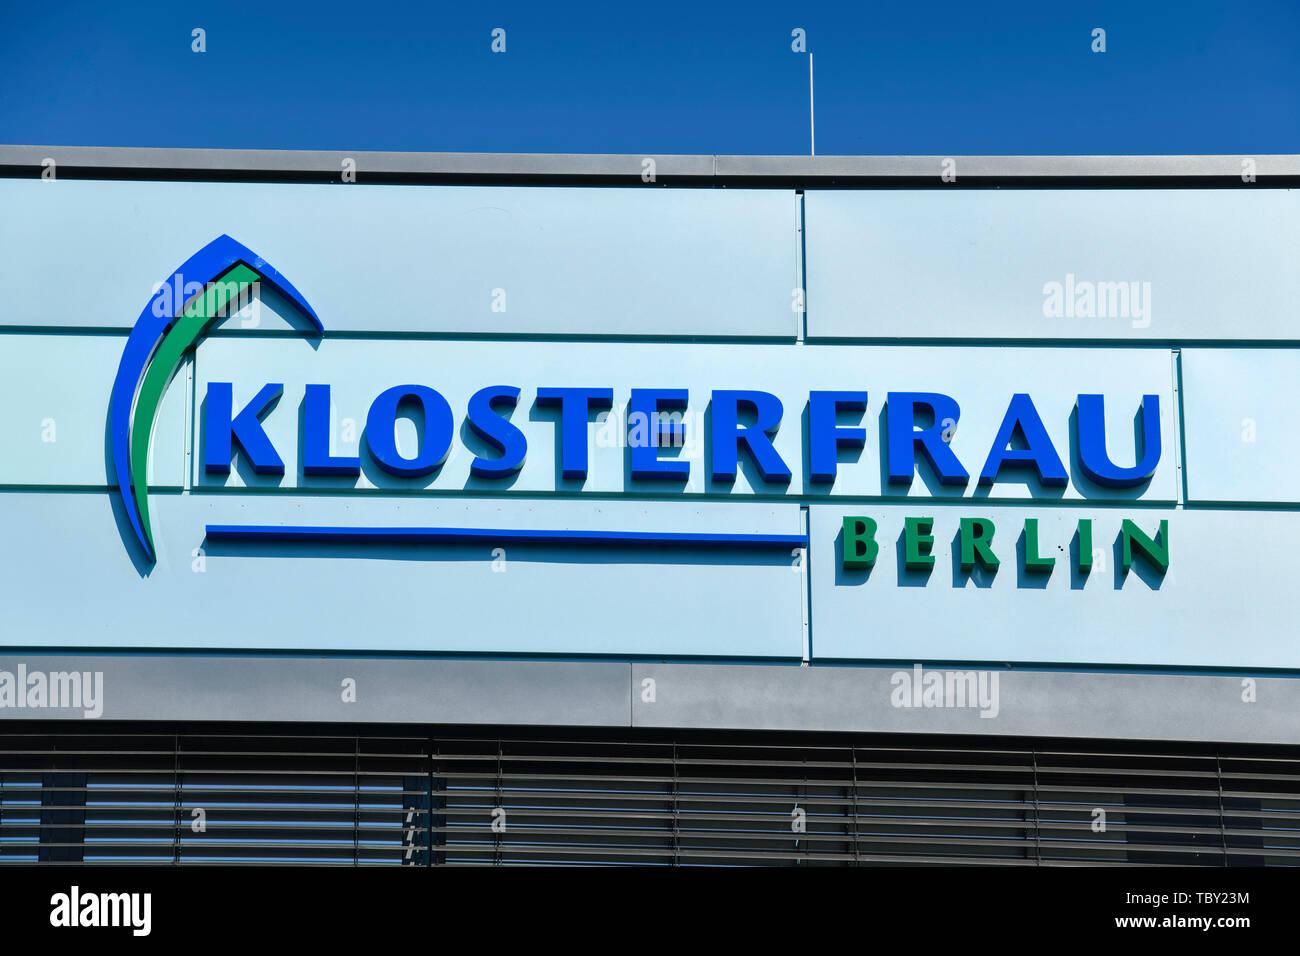 Cloister woman Pharma, Motzener street, to Marien's field, temple court nice mountain, Berlin, Germany, Klosterfrau Pharma, Motzener Straße, Marienfel Stock Photo